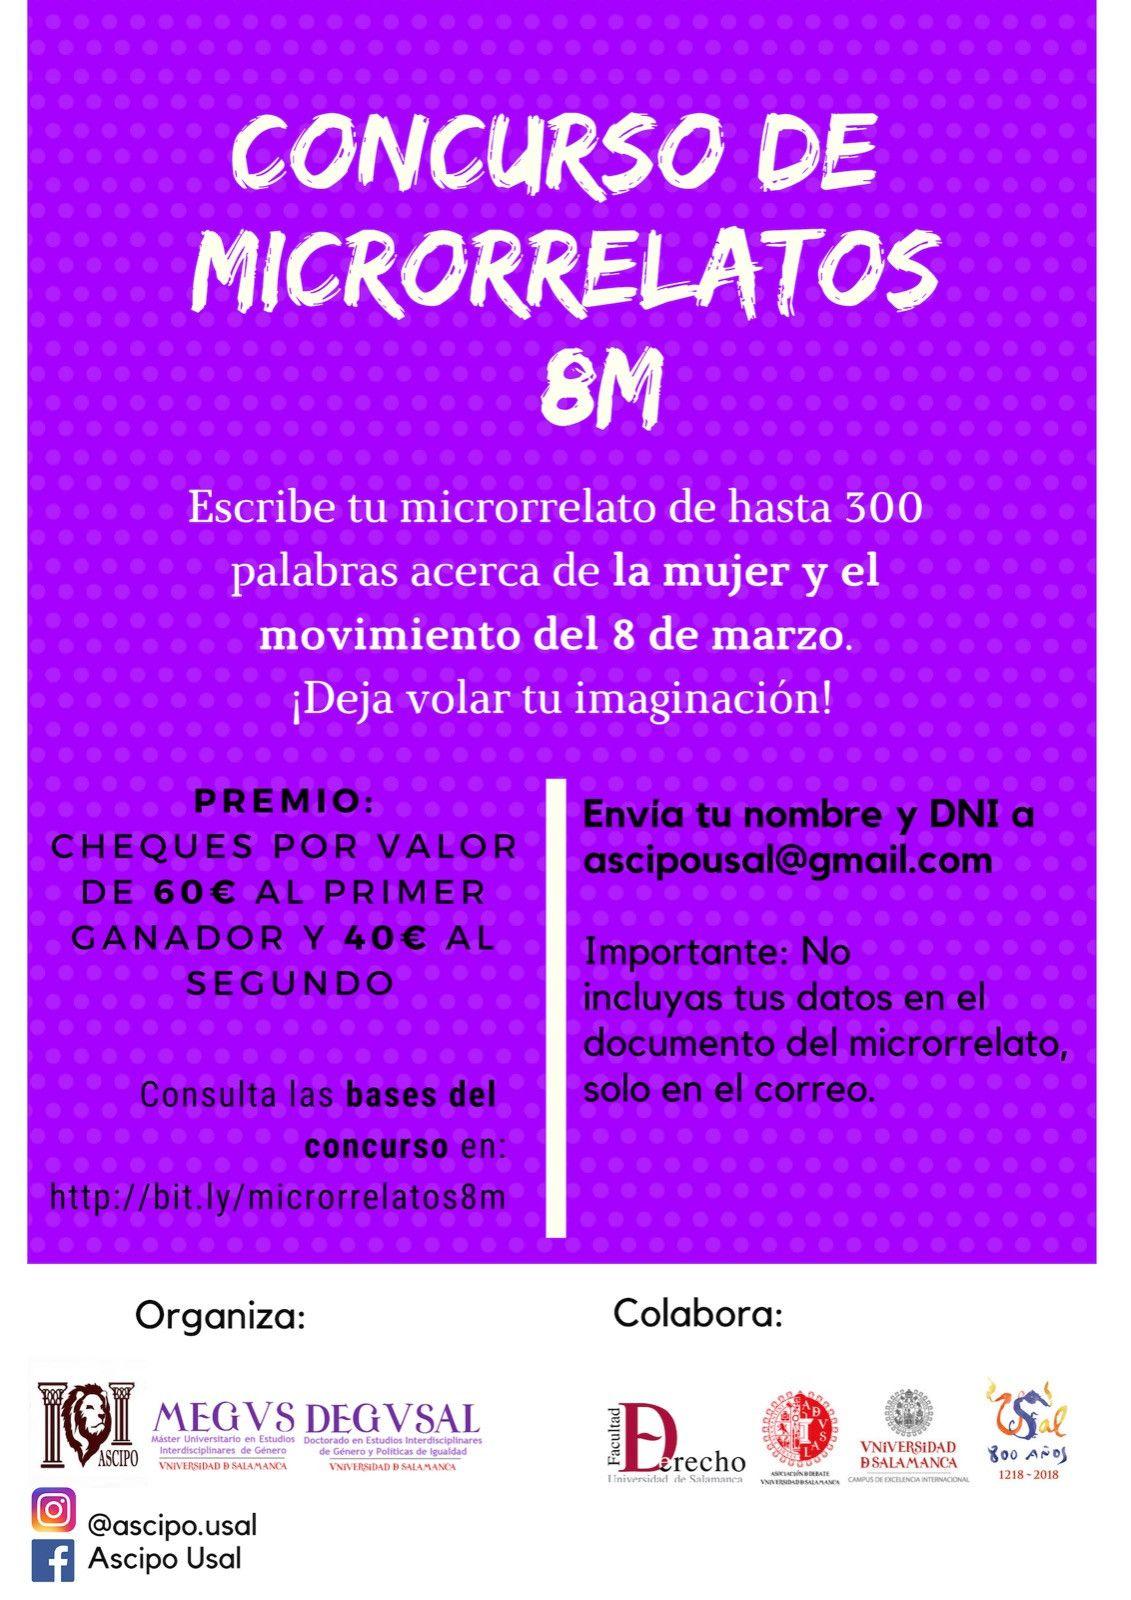 Concurso microrelatos 8M